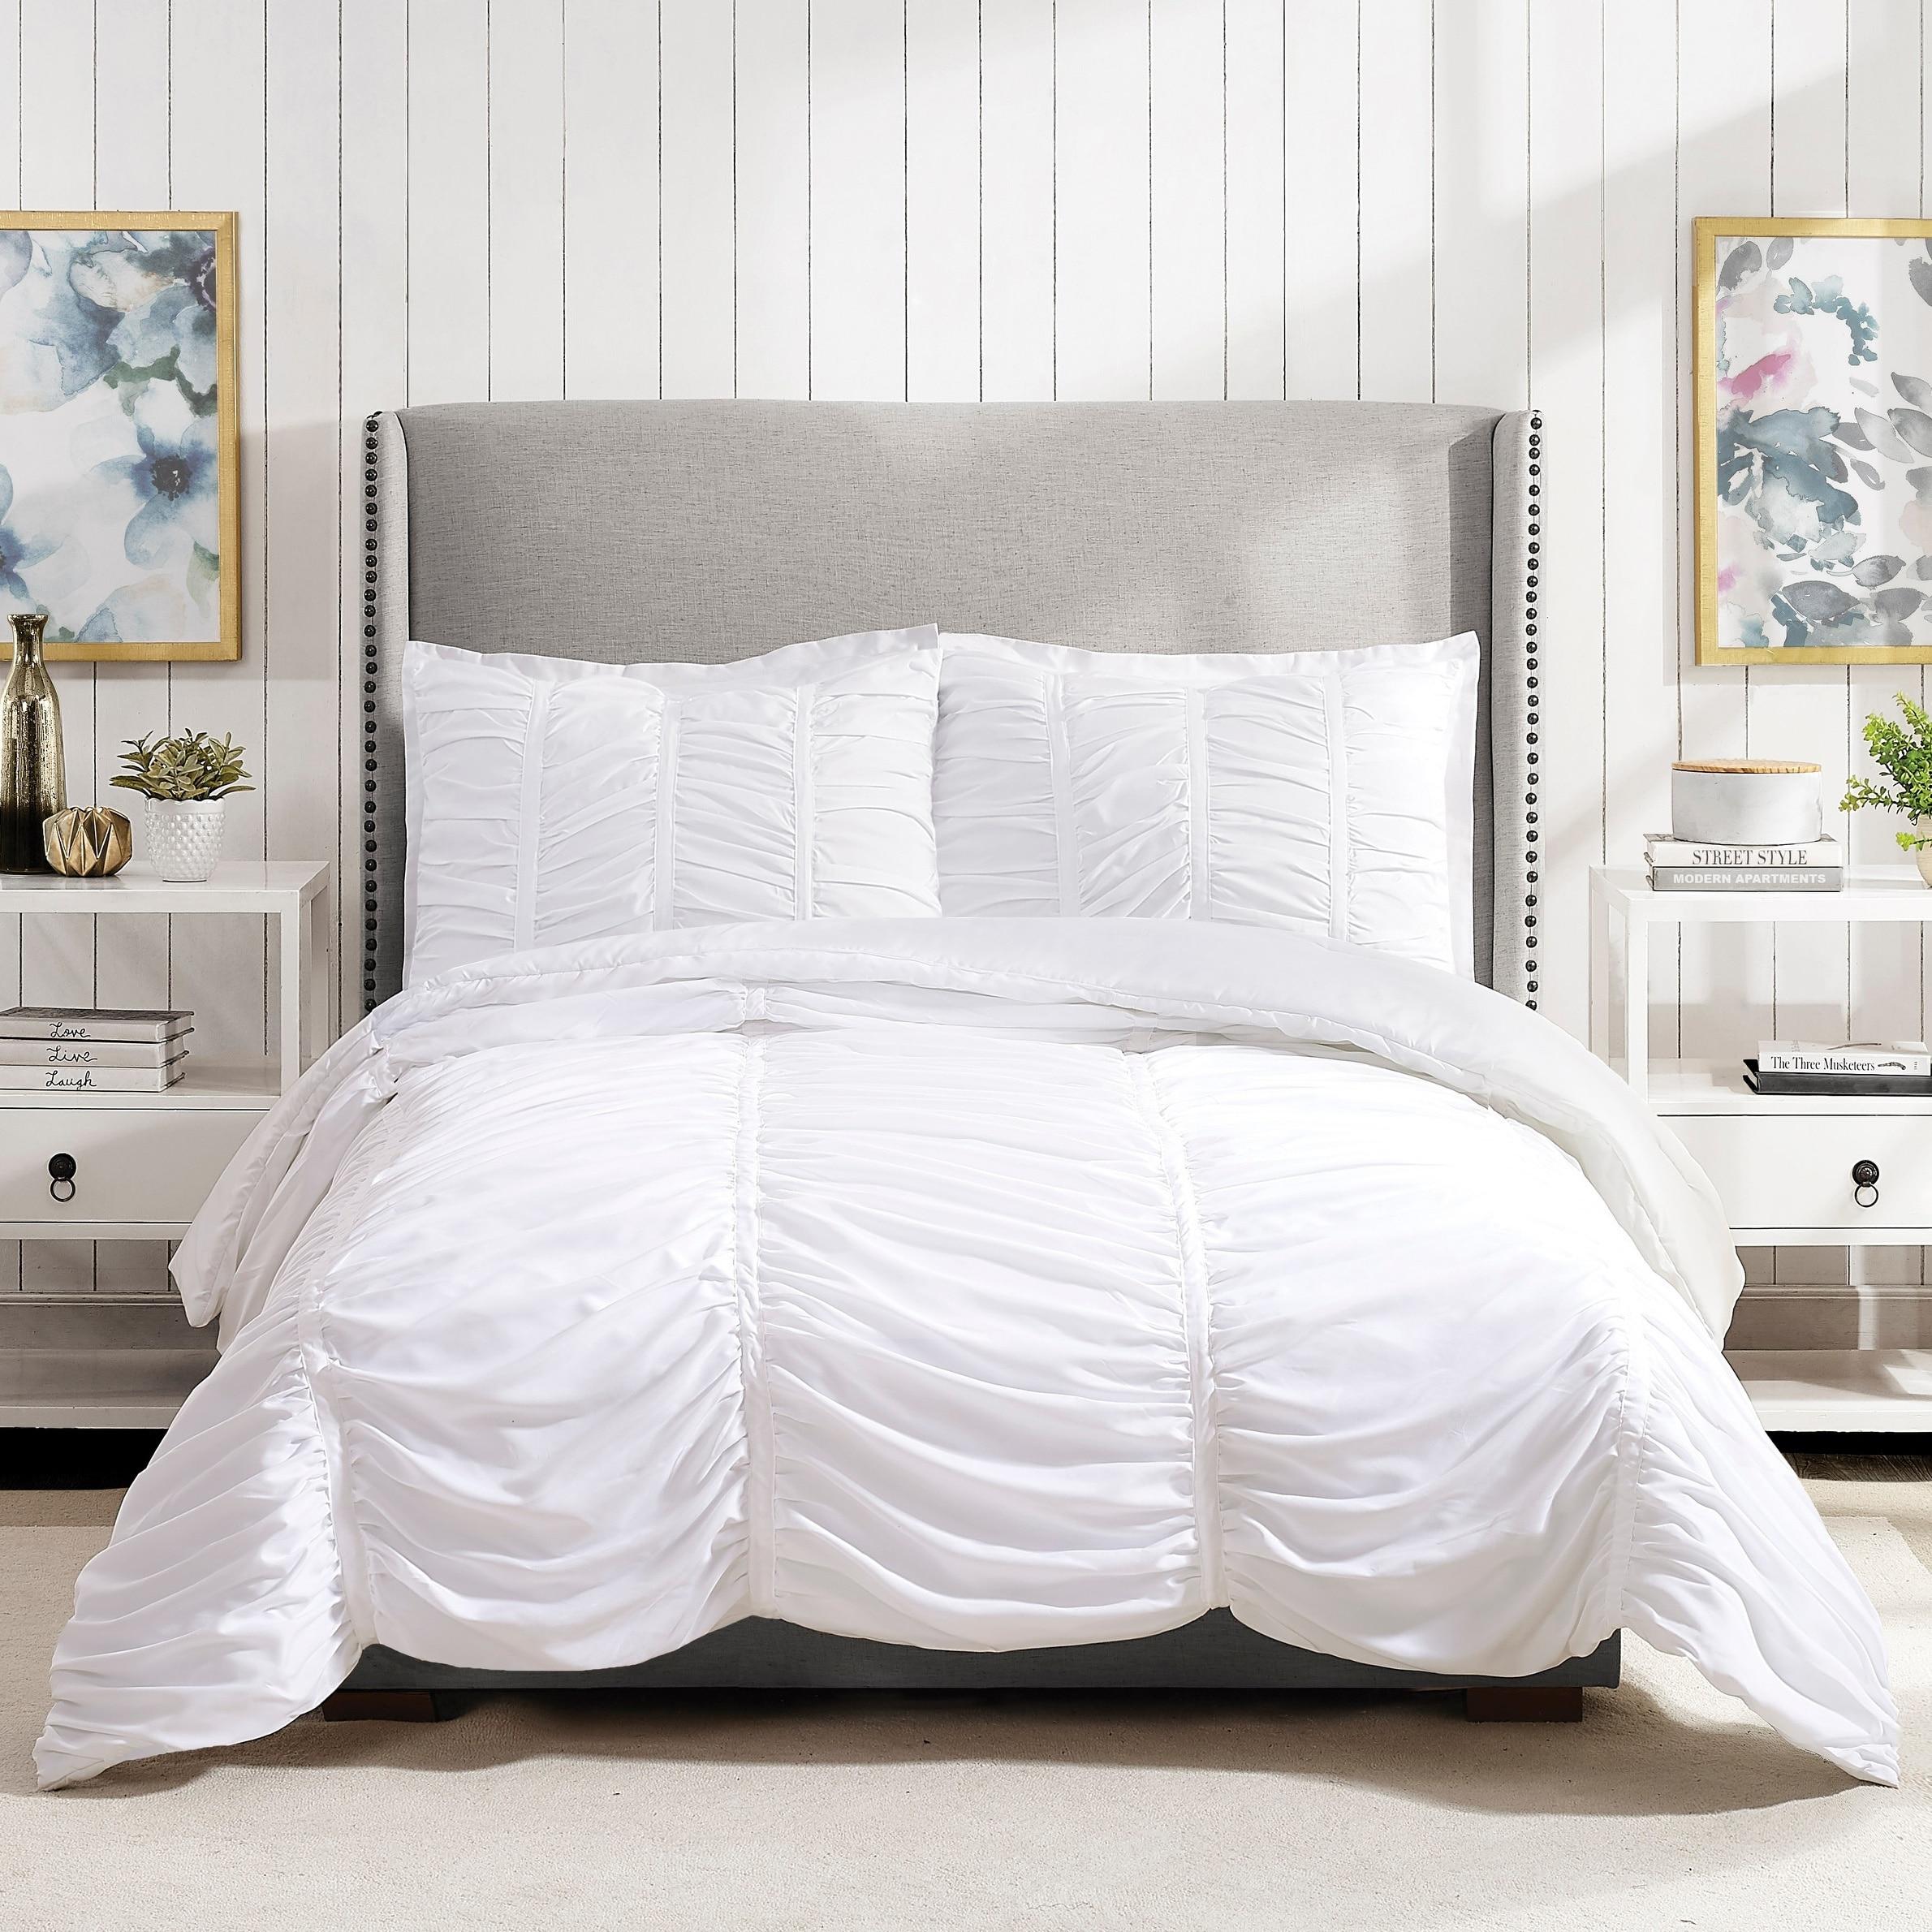 Shop Porch Den Pastern White Textured Twin Twin Xl Comforter Set